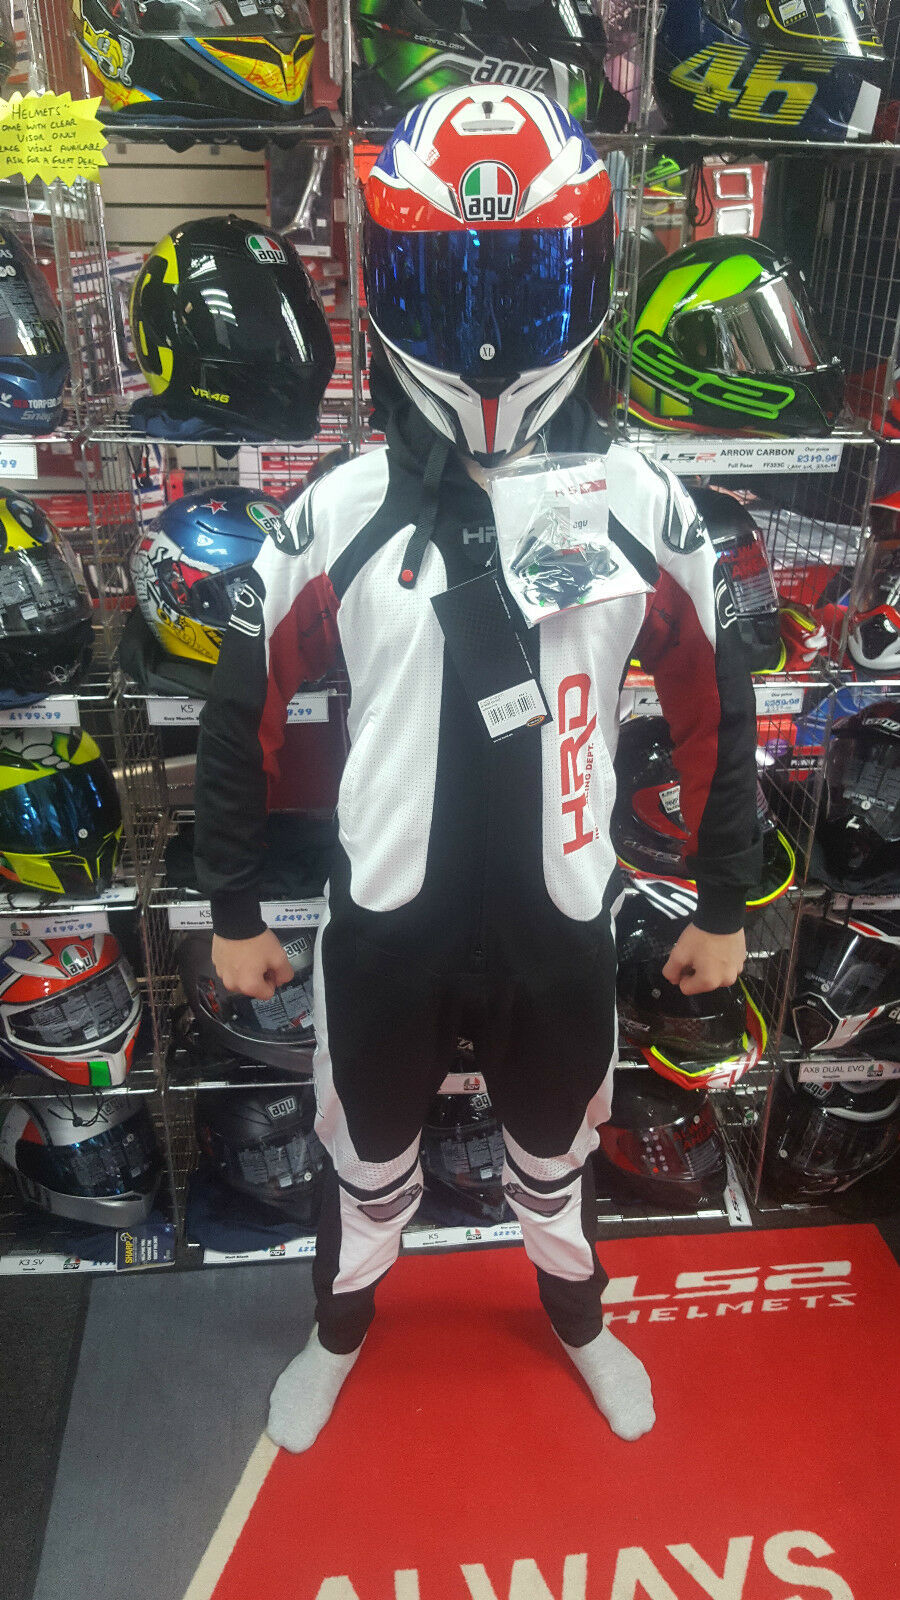 2017 MOTORCYCLE  PYJAMA RACE SUIT REPLICA ONE PIECE LEATHERS FANCY DRESS COTTON